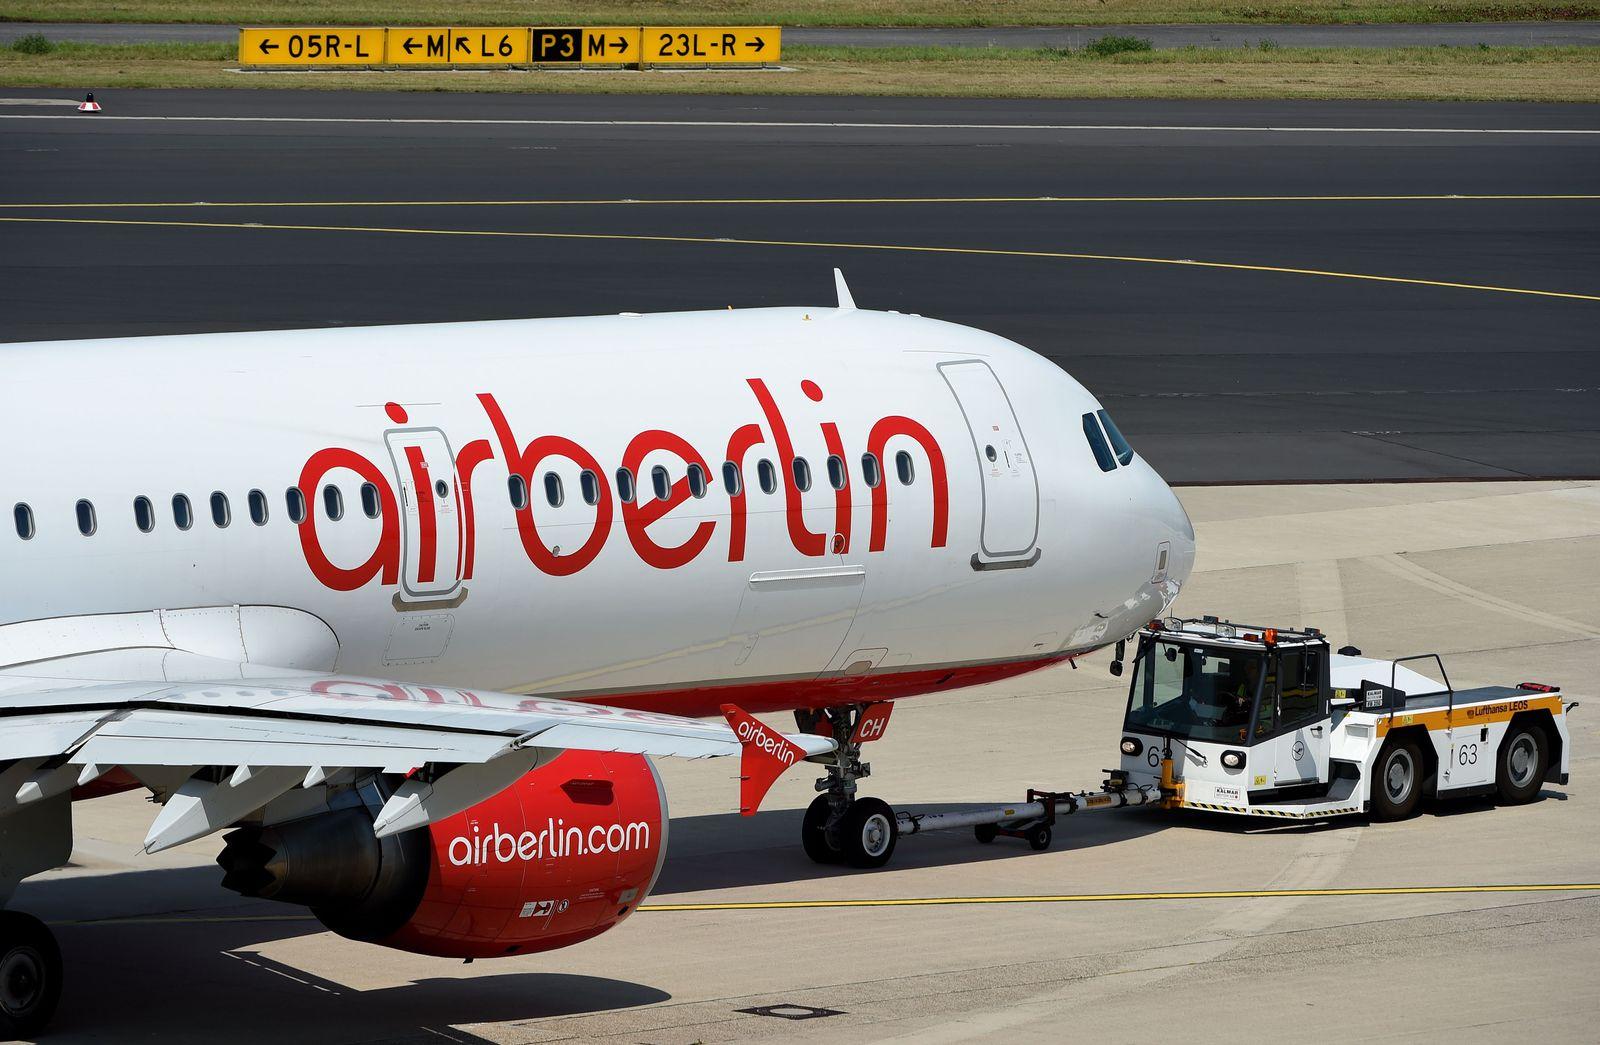 GERMANY-UAE-AVIATION-COURT-ETIHAD-AIRBERLIN-FILES Air Berlin Etihad